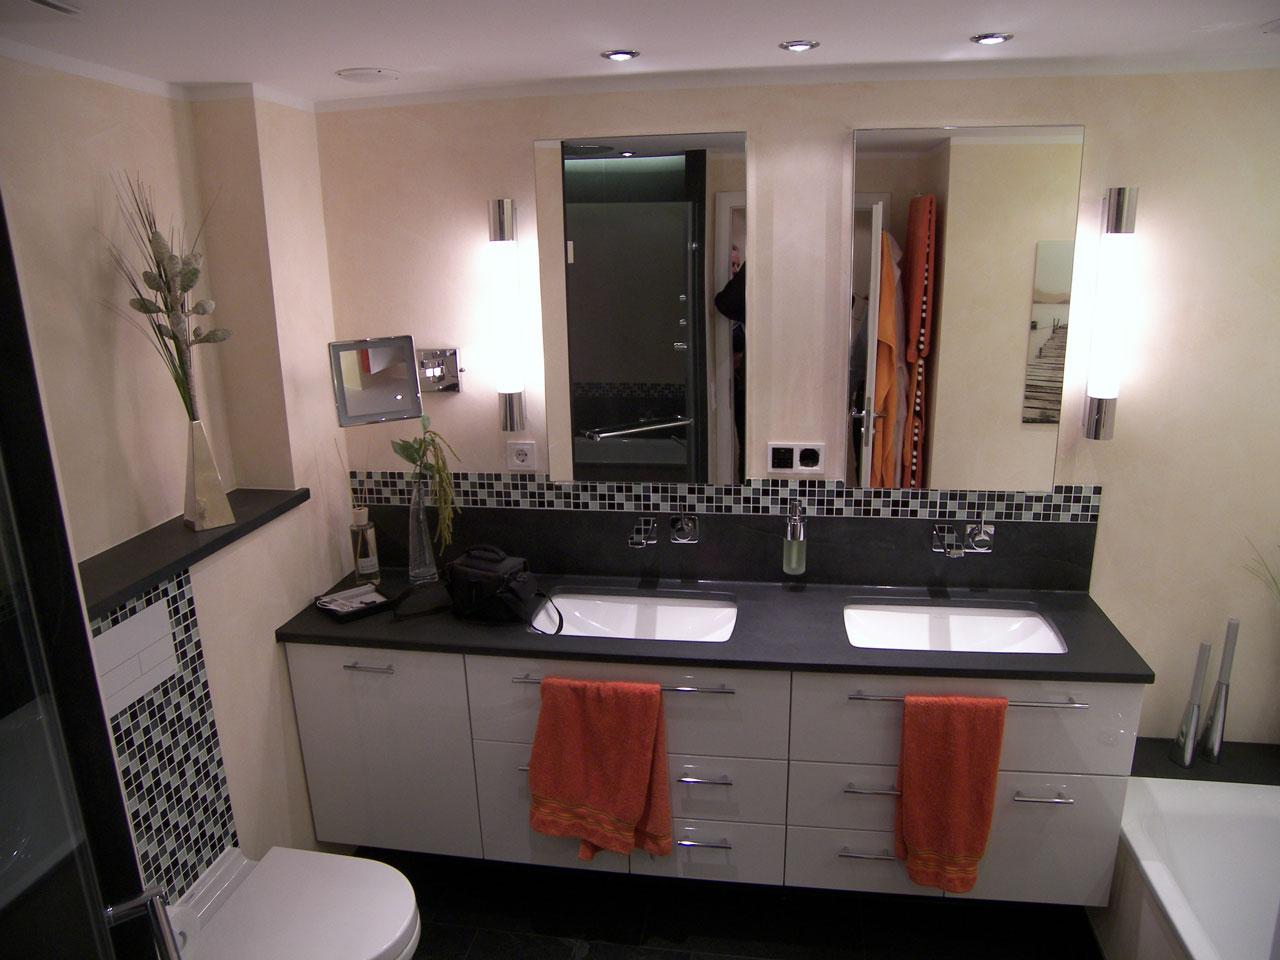 Badezimmer Akzente Stauraum Beleuchtung